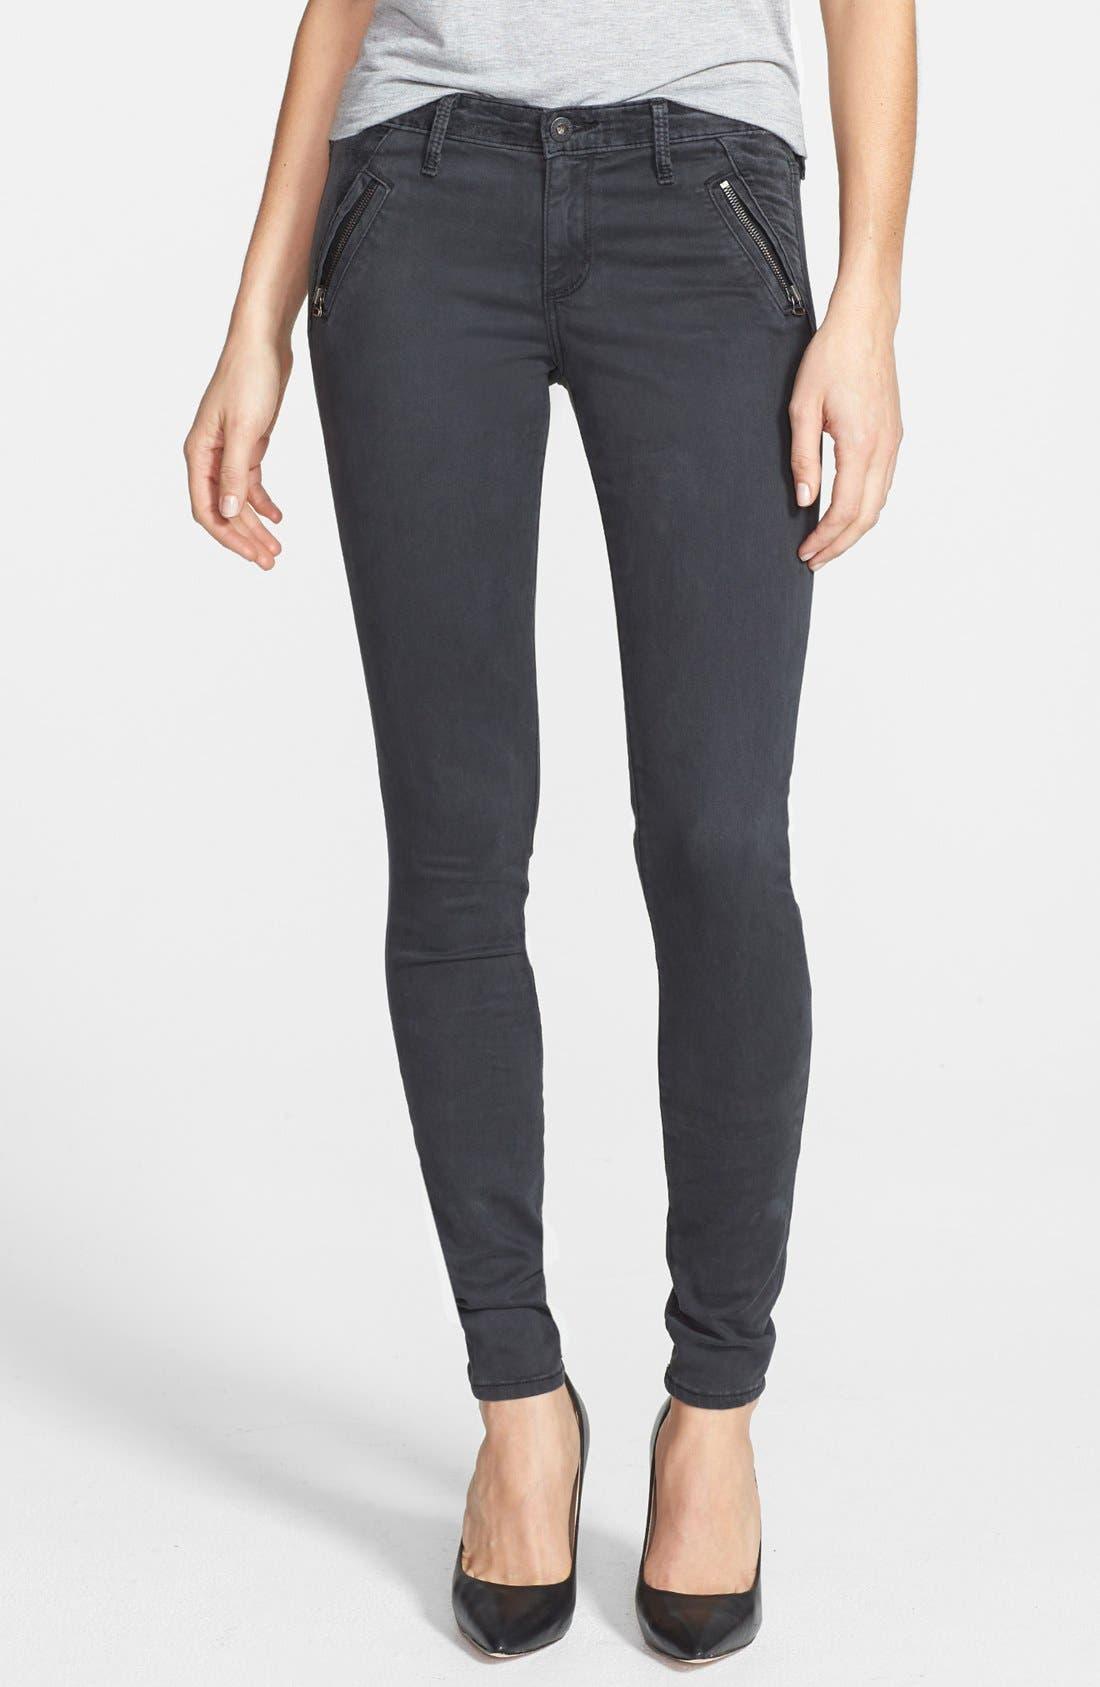 Alternate Image 1 Selected - AG Zip Pocket Sateen Skinny Jeans (Sulfur Dark Charcoal)